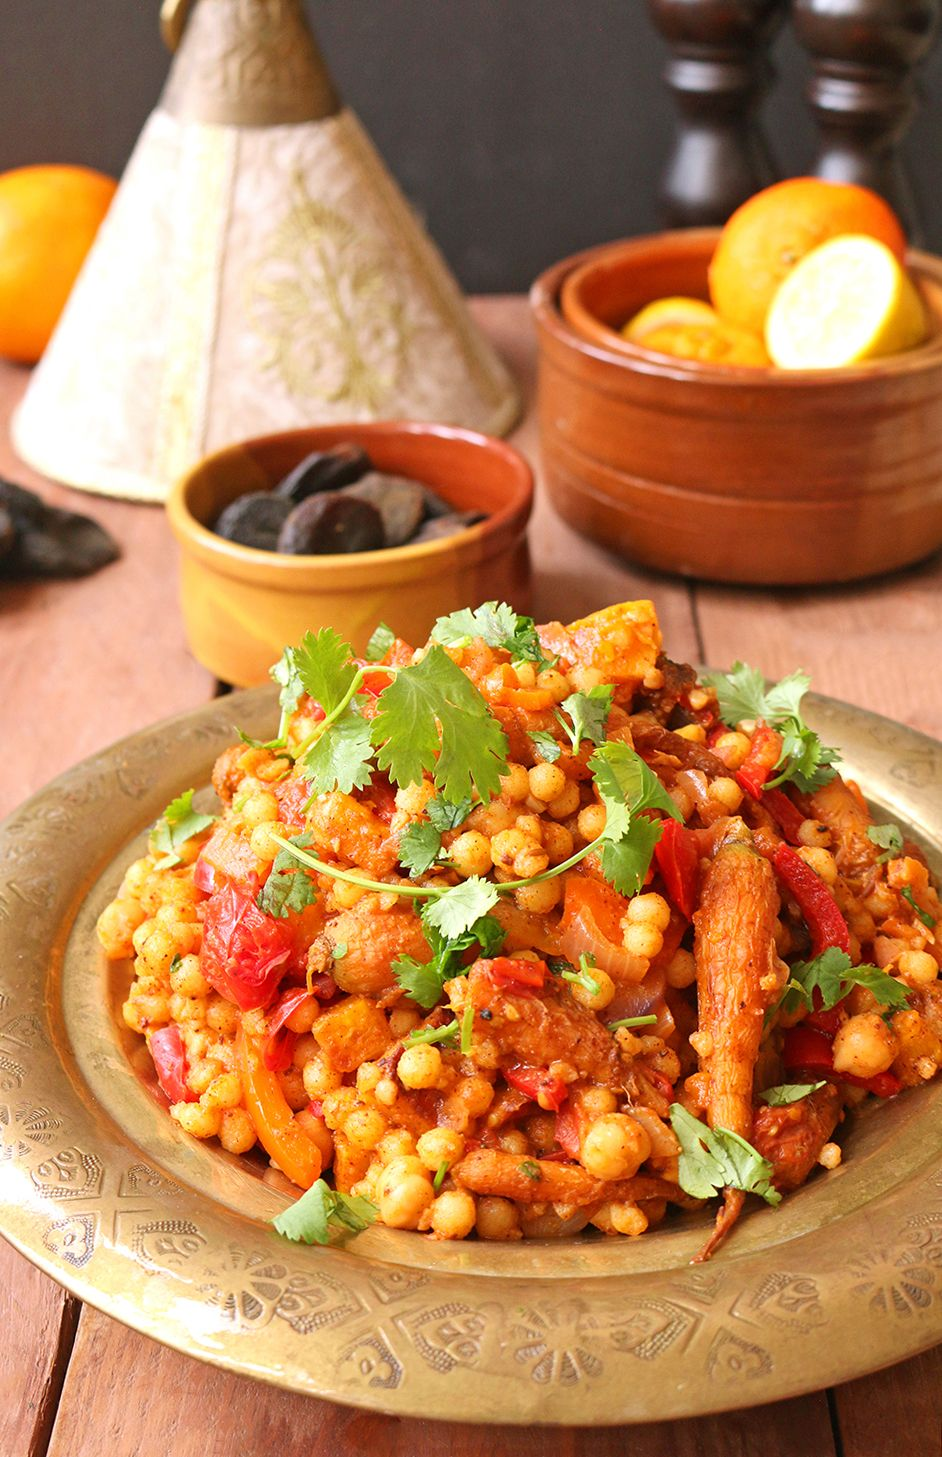 Moroccan-style Moghrabieh Couscous | One Arab Vegan